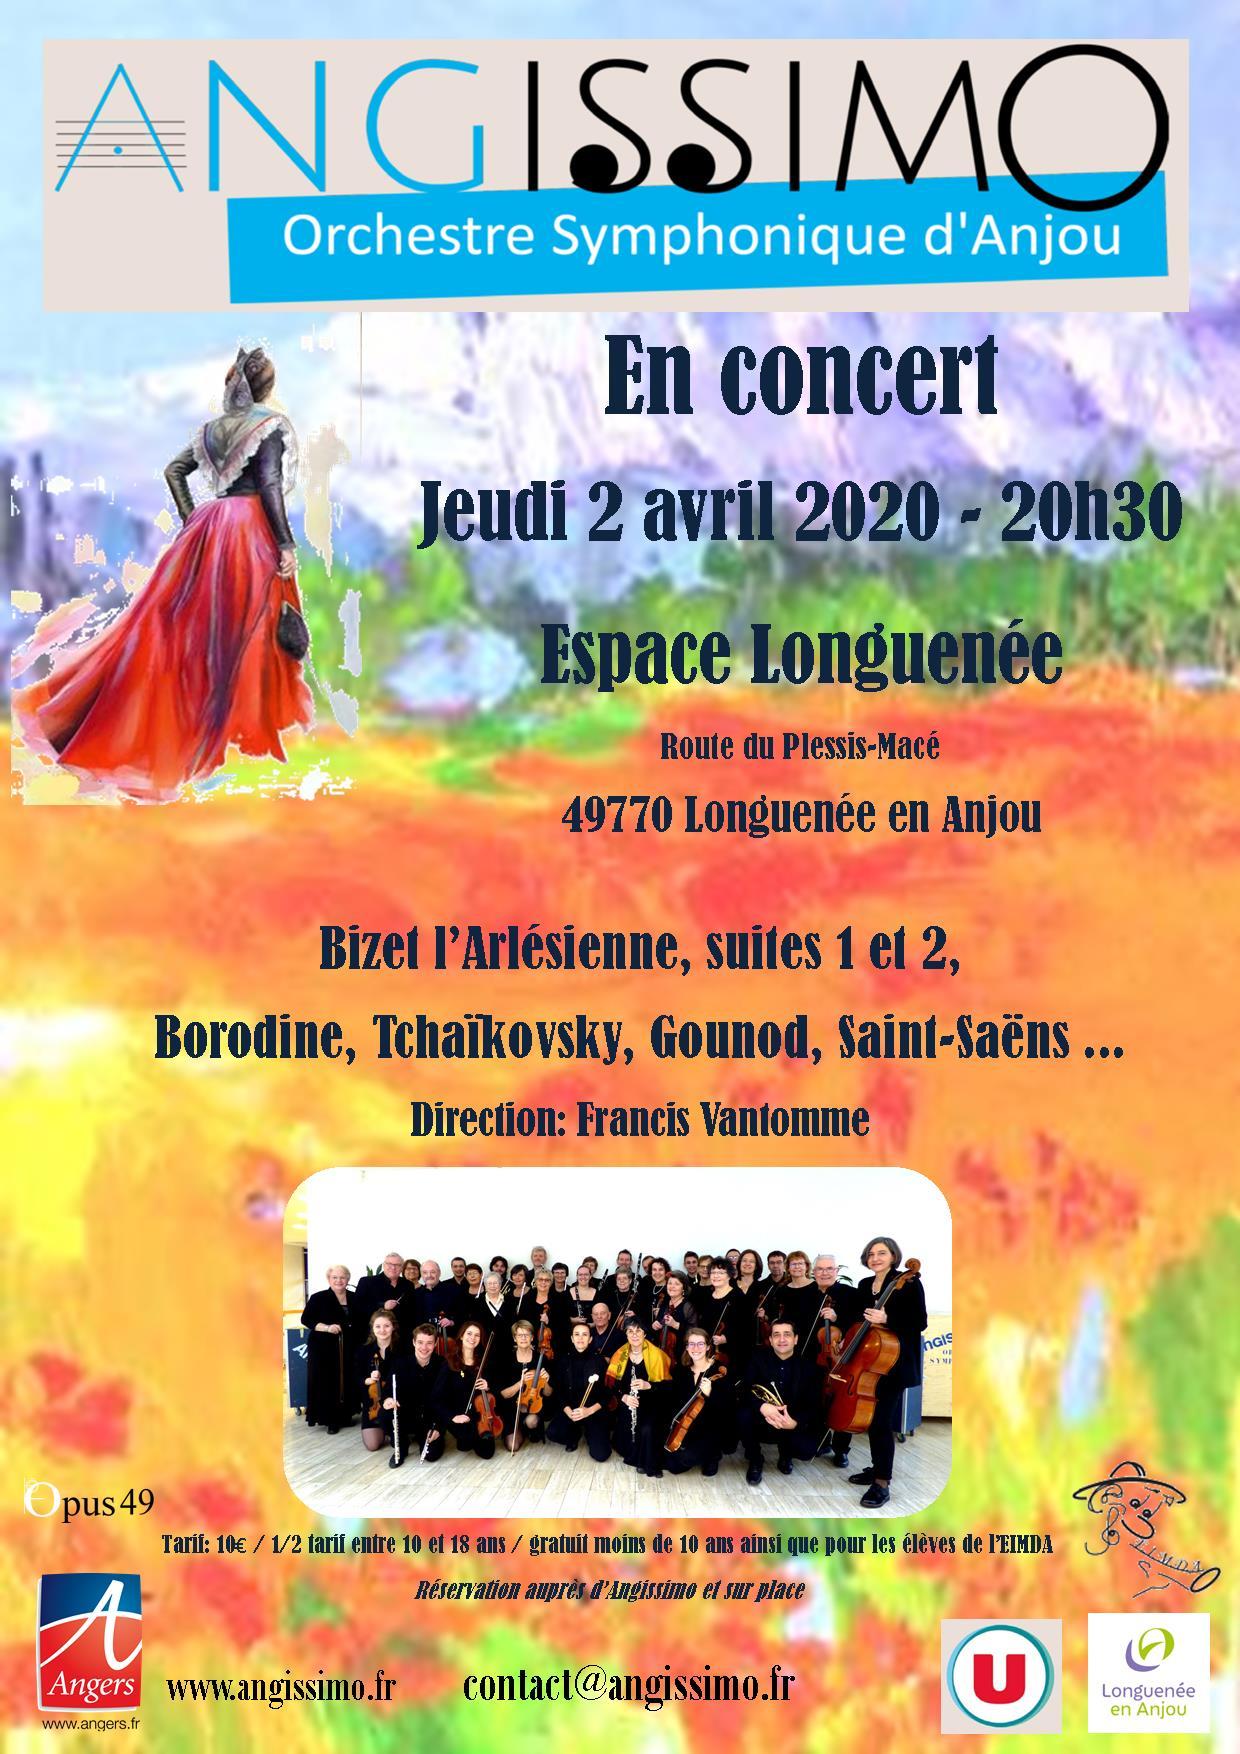 Affiche 2 avril 2020 Longuenée en Anjou avec logos